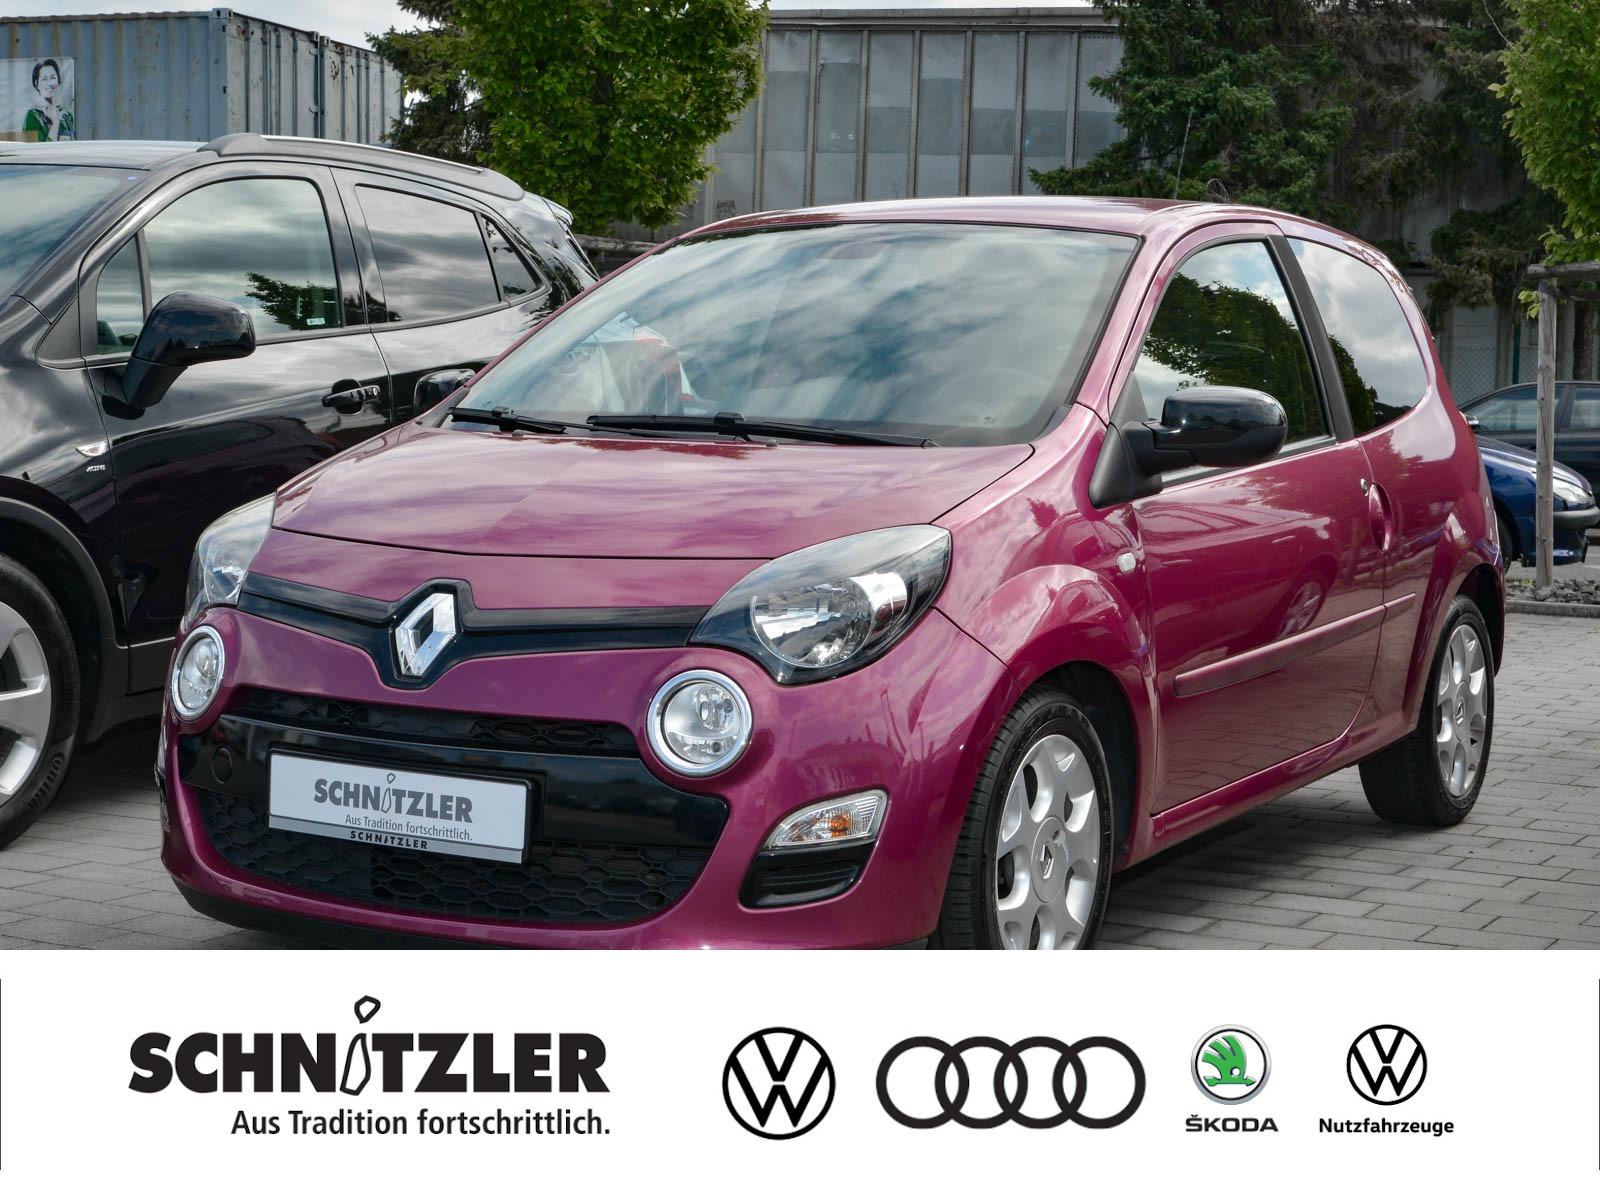 Renault Twingo 1.2 Dynamique KLIMA+++, Jahr 2014, Benzin